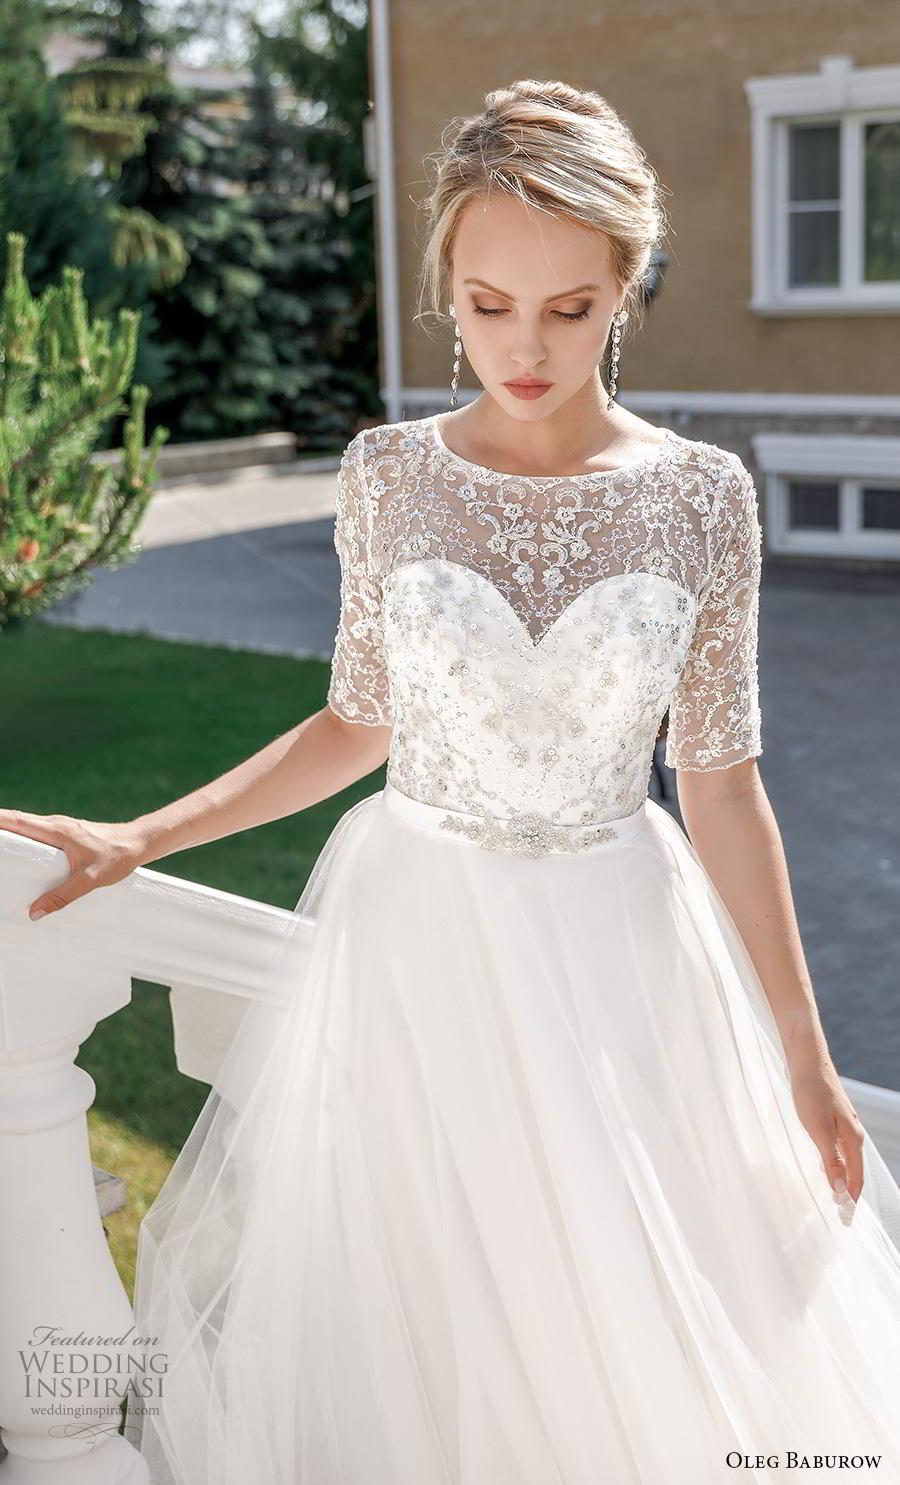 oleg baburow 2020 bridal half sleeves illusion jewel sweetheart neckline heavily embellished bodice romantic soft a  line wedding dress keyhole corset back chapel train (7) zv